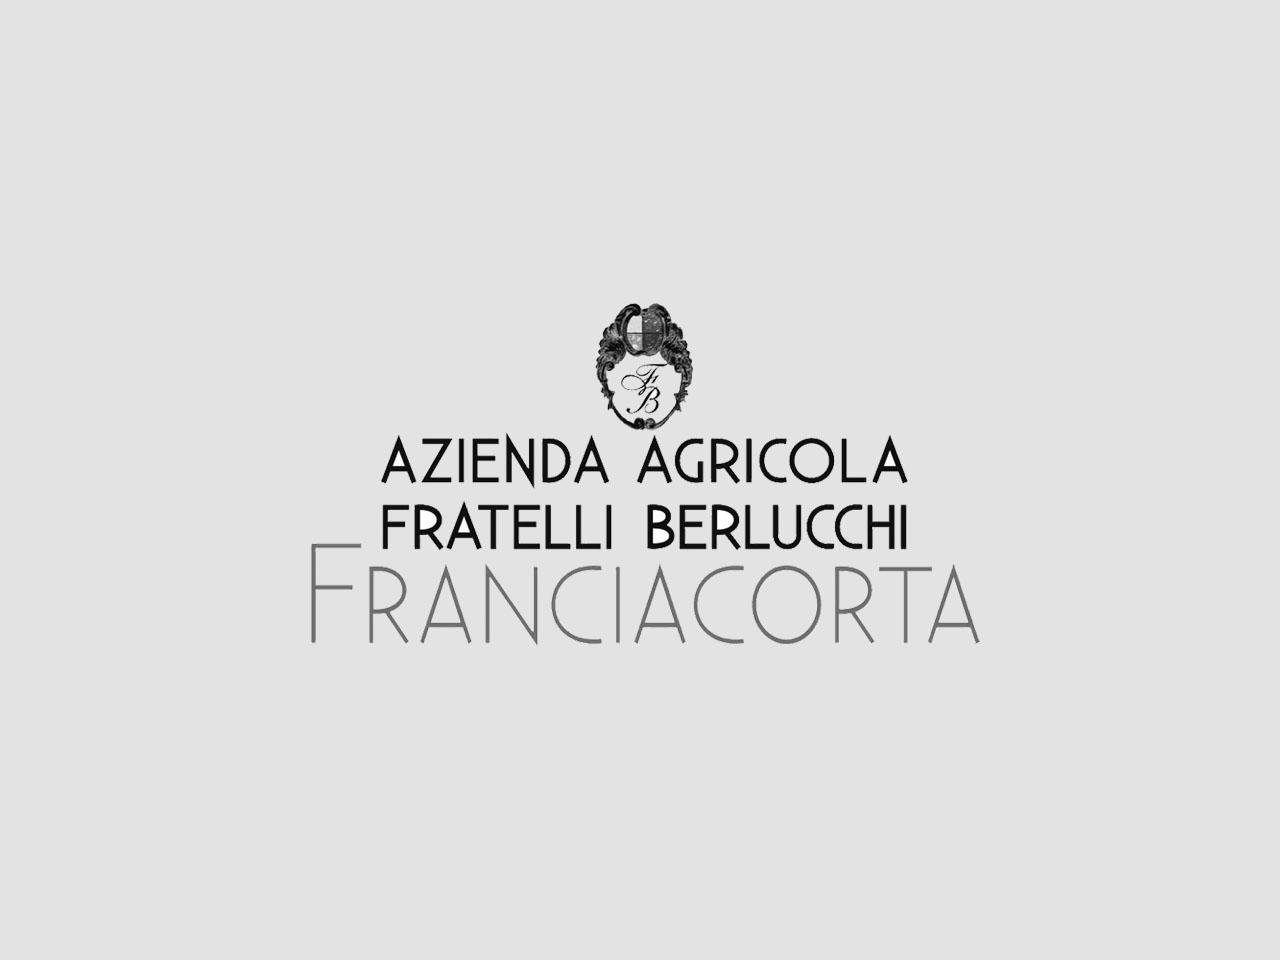 siti-web-seo-newsletter-social-network-fratelli-berlucchi-contessi-fostinelli